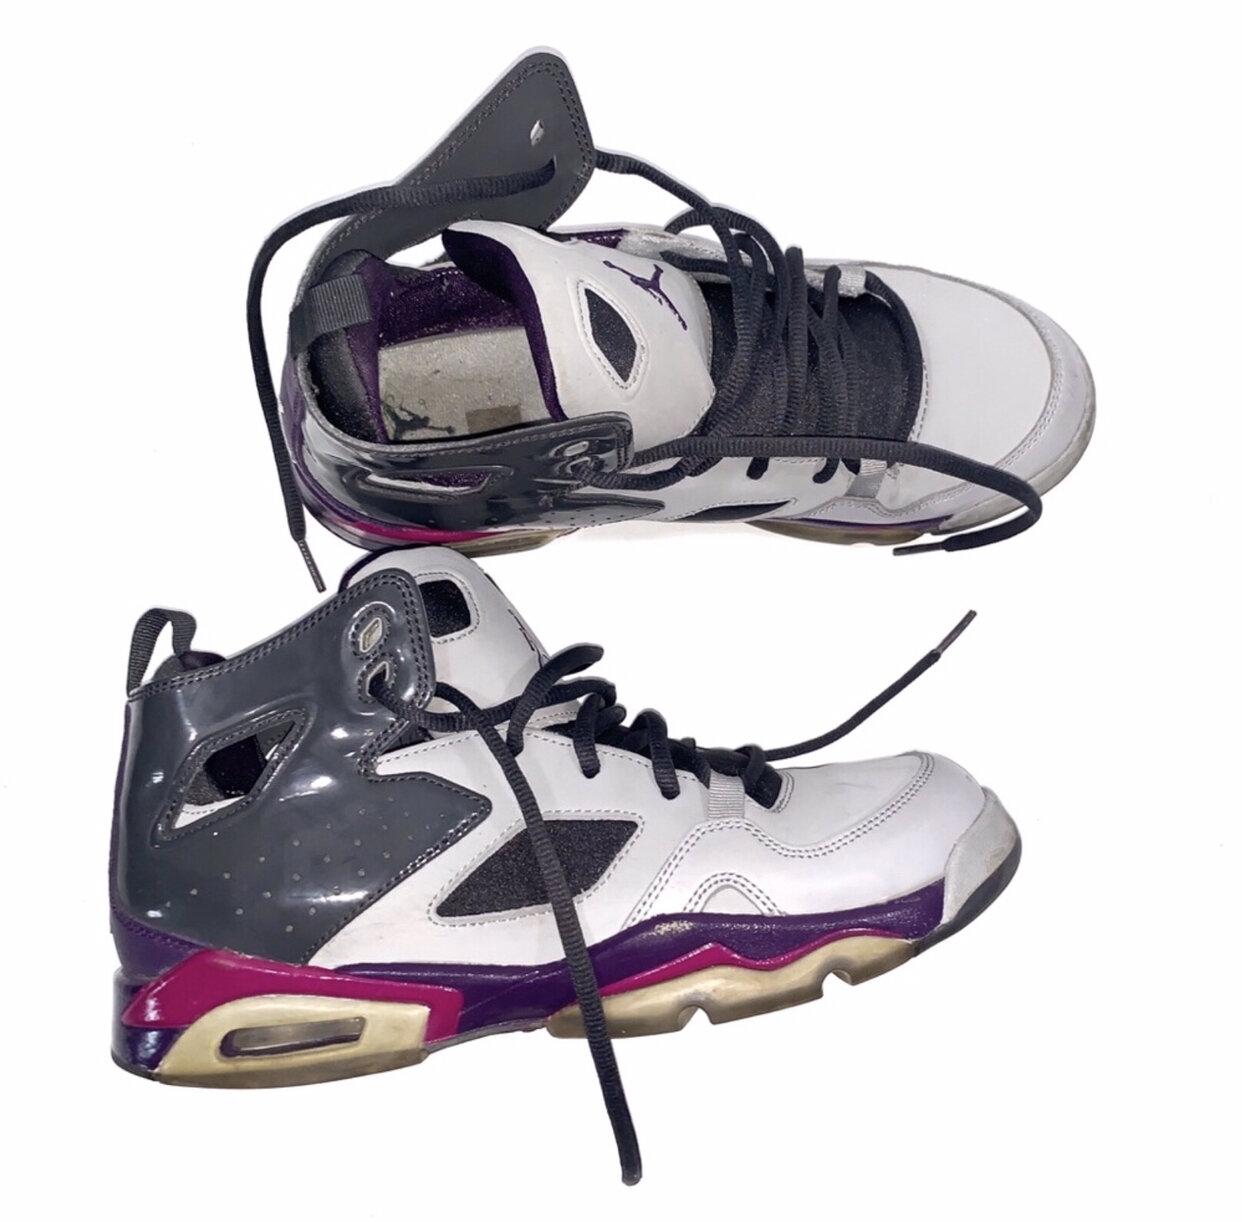 Nike Air Jordan Fight Club 91 7Y basketball shoe